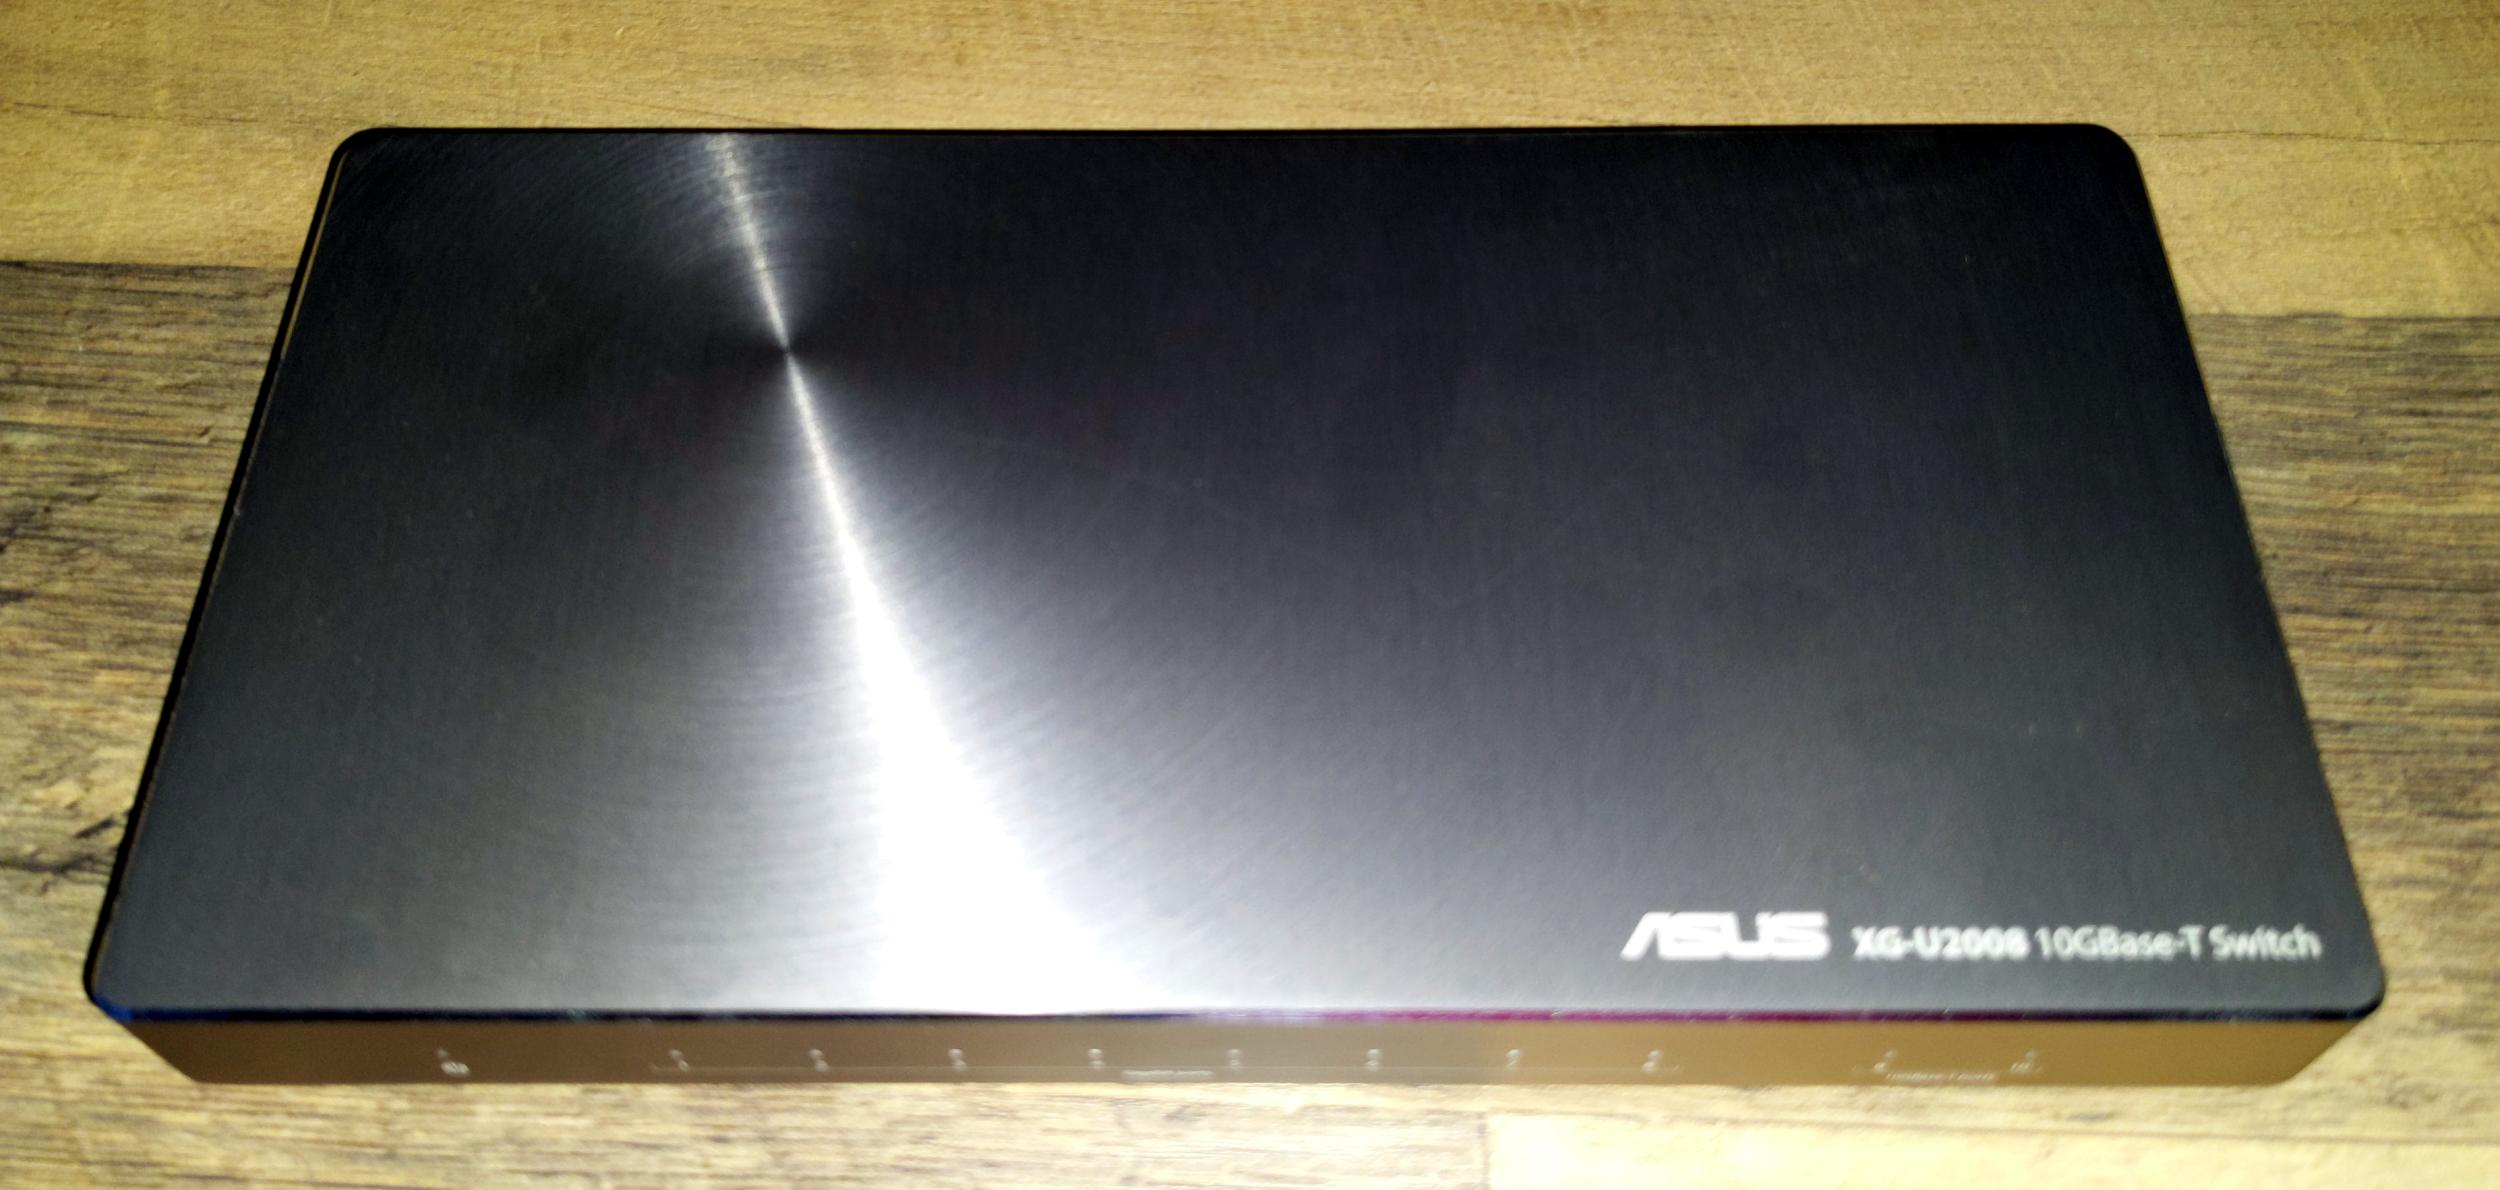 ASUS XG-U2008 network switch